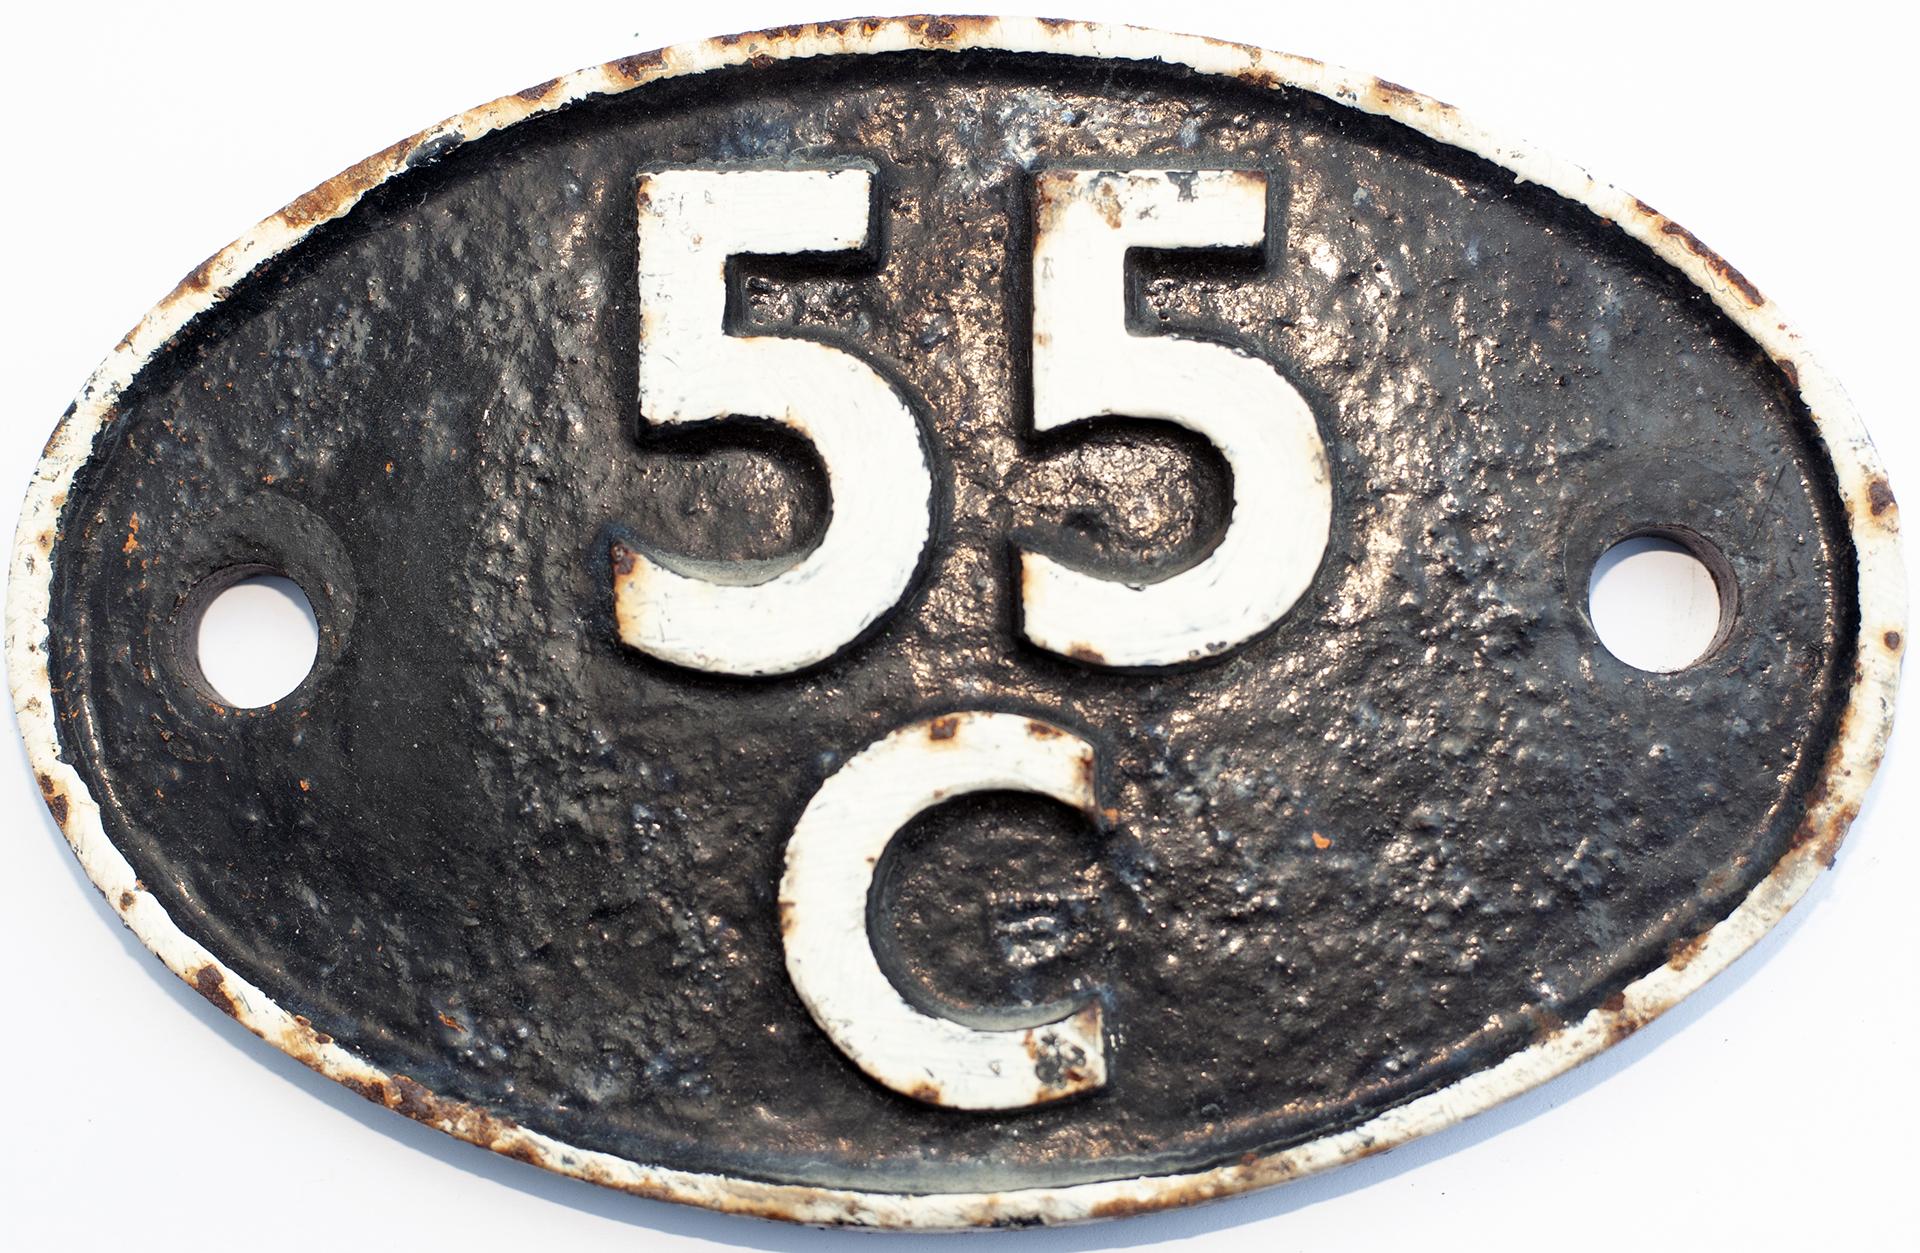 Shedplate 55c Farnley Junction 1956-1966. Lightly